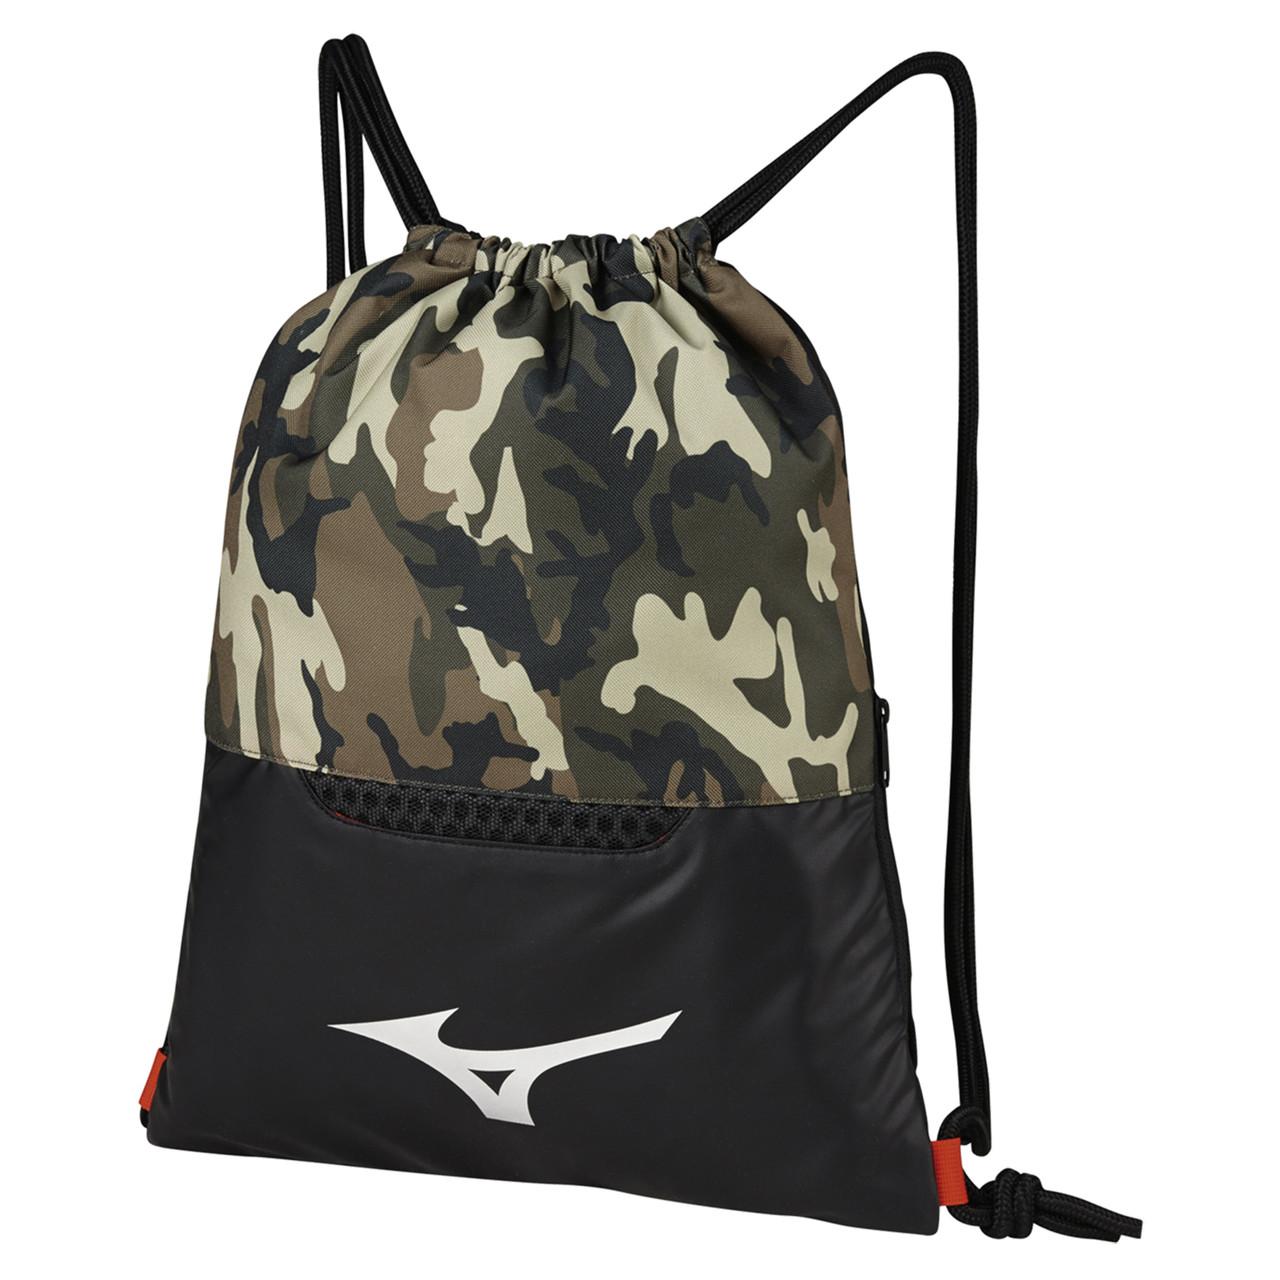 Спортивная сумка-мешок Mizuno Style Draw Bag 33GD8008-91